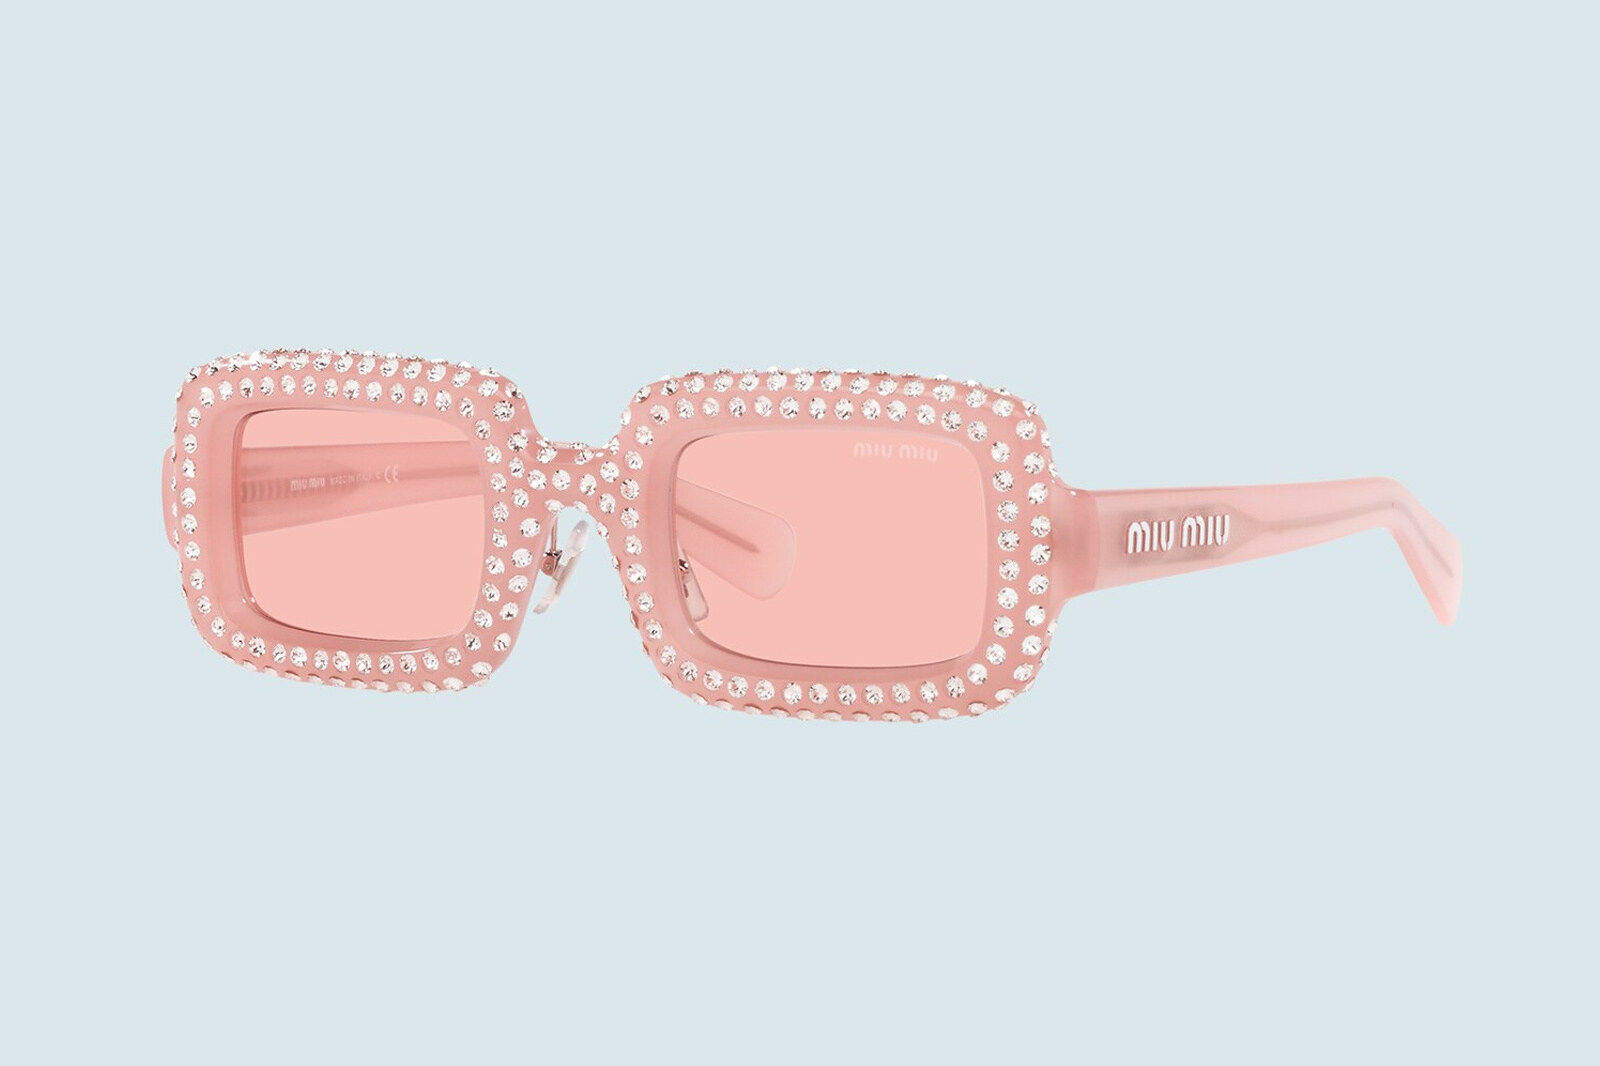 Miu Miu occhiali da sole Eyewear Collection